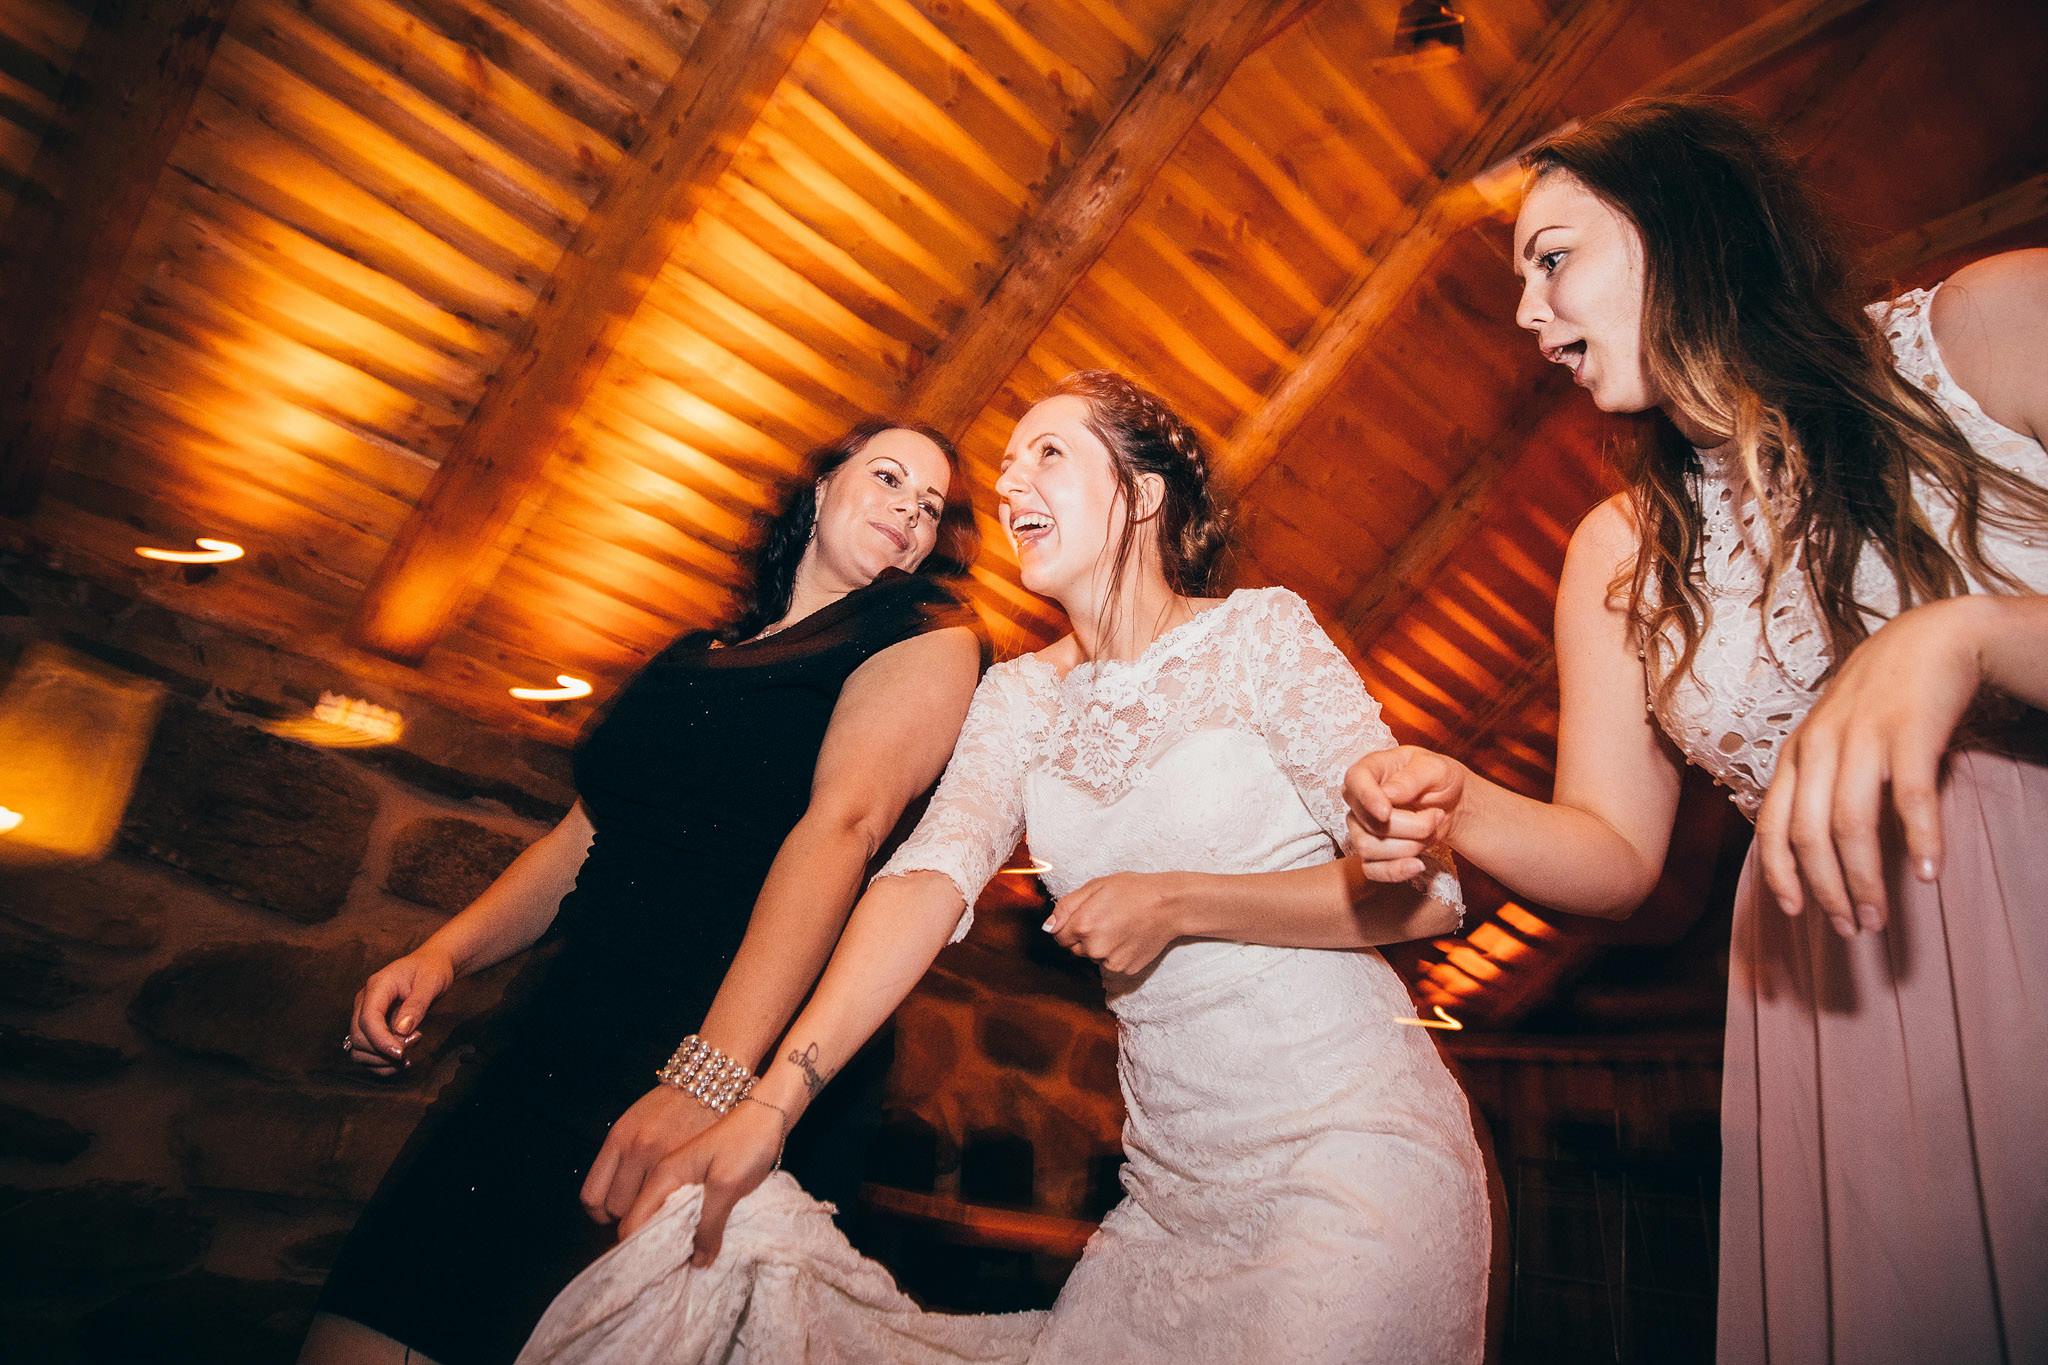 Norway+wedding+photographer+elopement+pre+wedding+Casey+Arneson-135.jpg